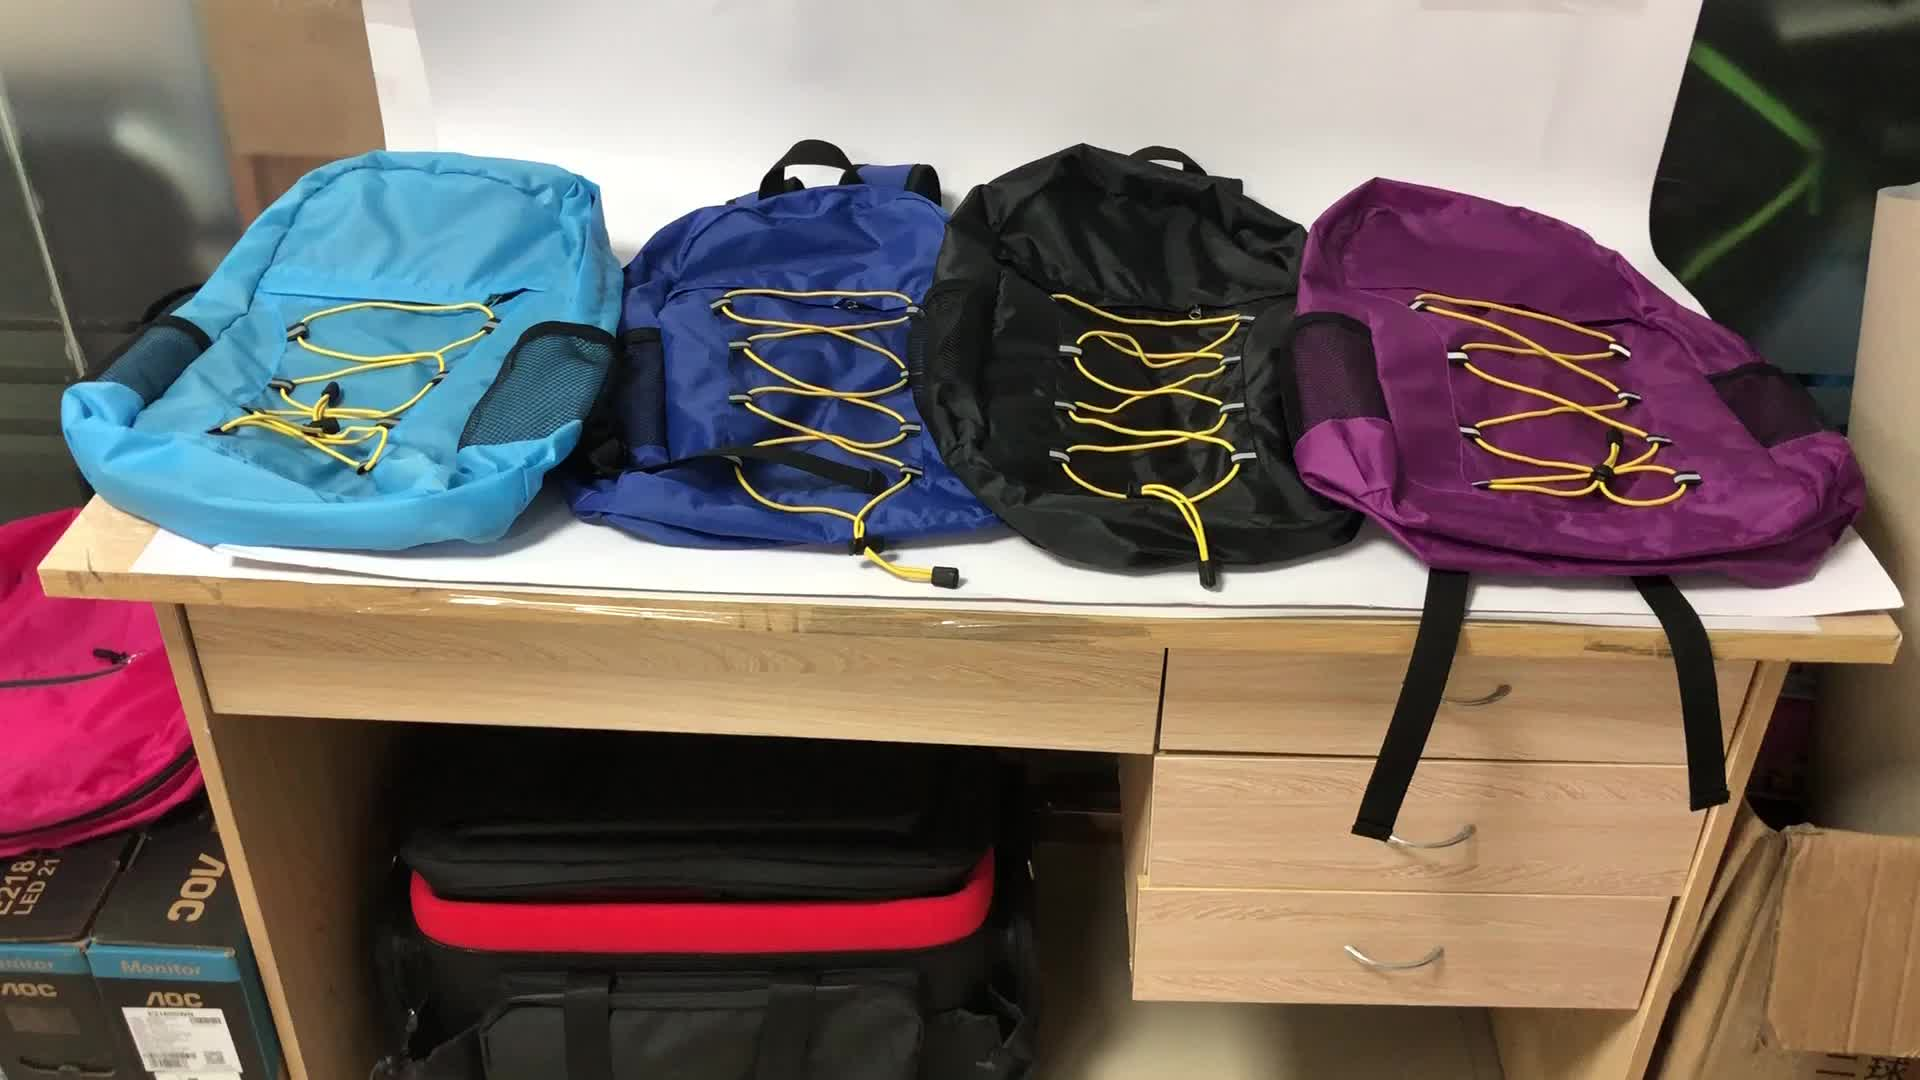 Hot Selling Foldable Backpacks China Alibaba Supplier Back Pack Bag